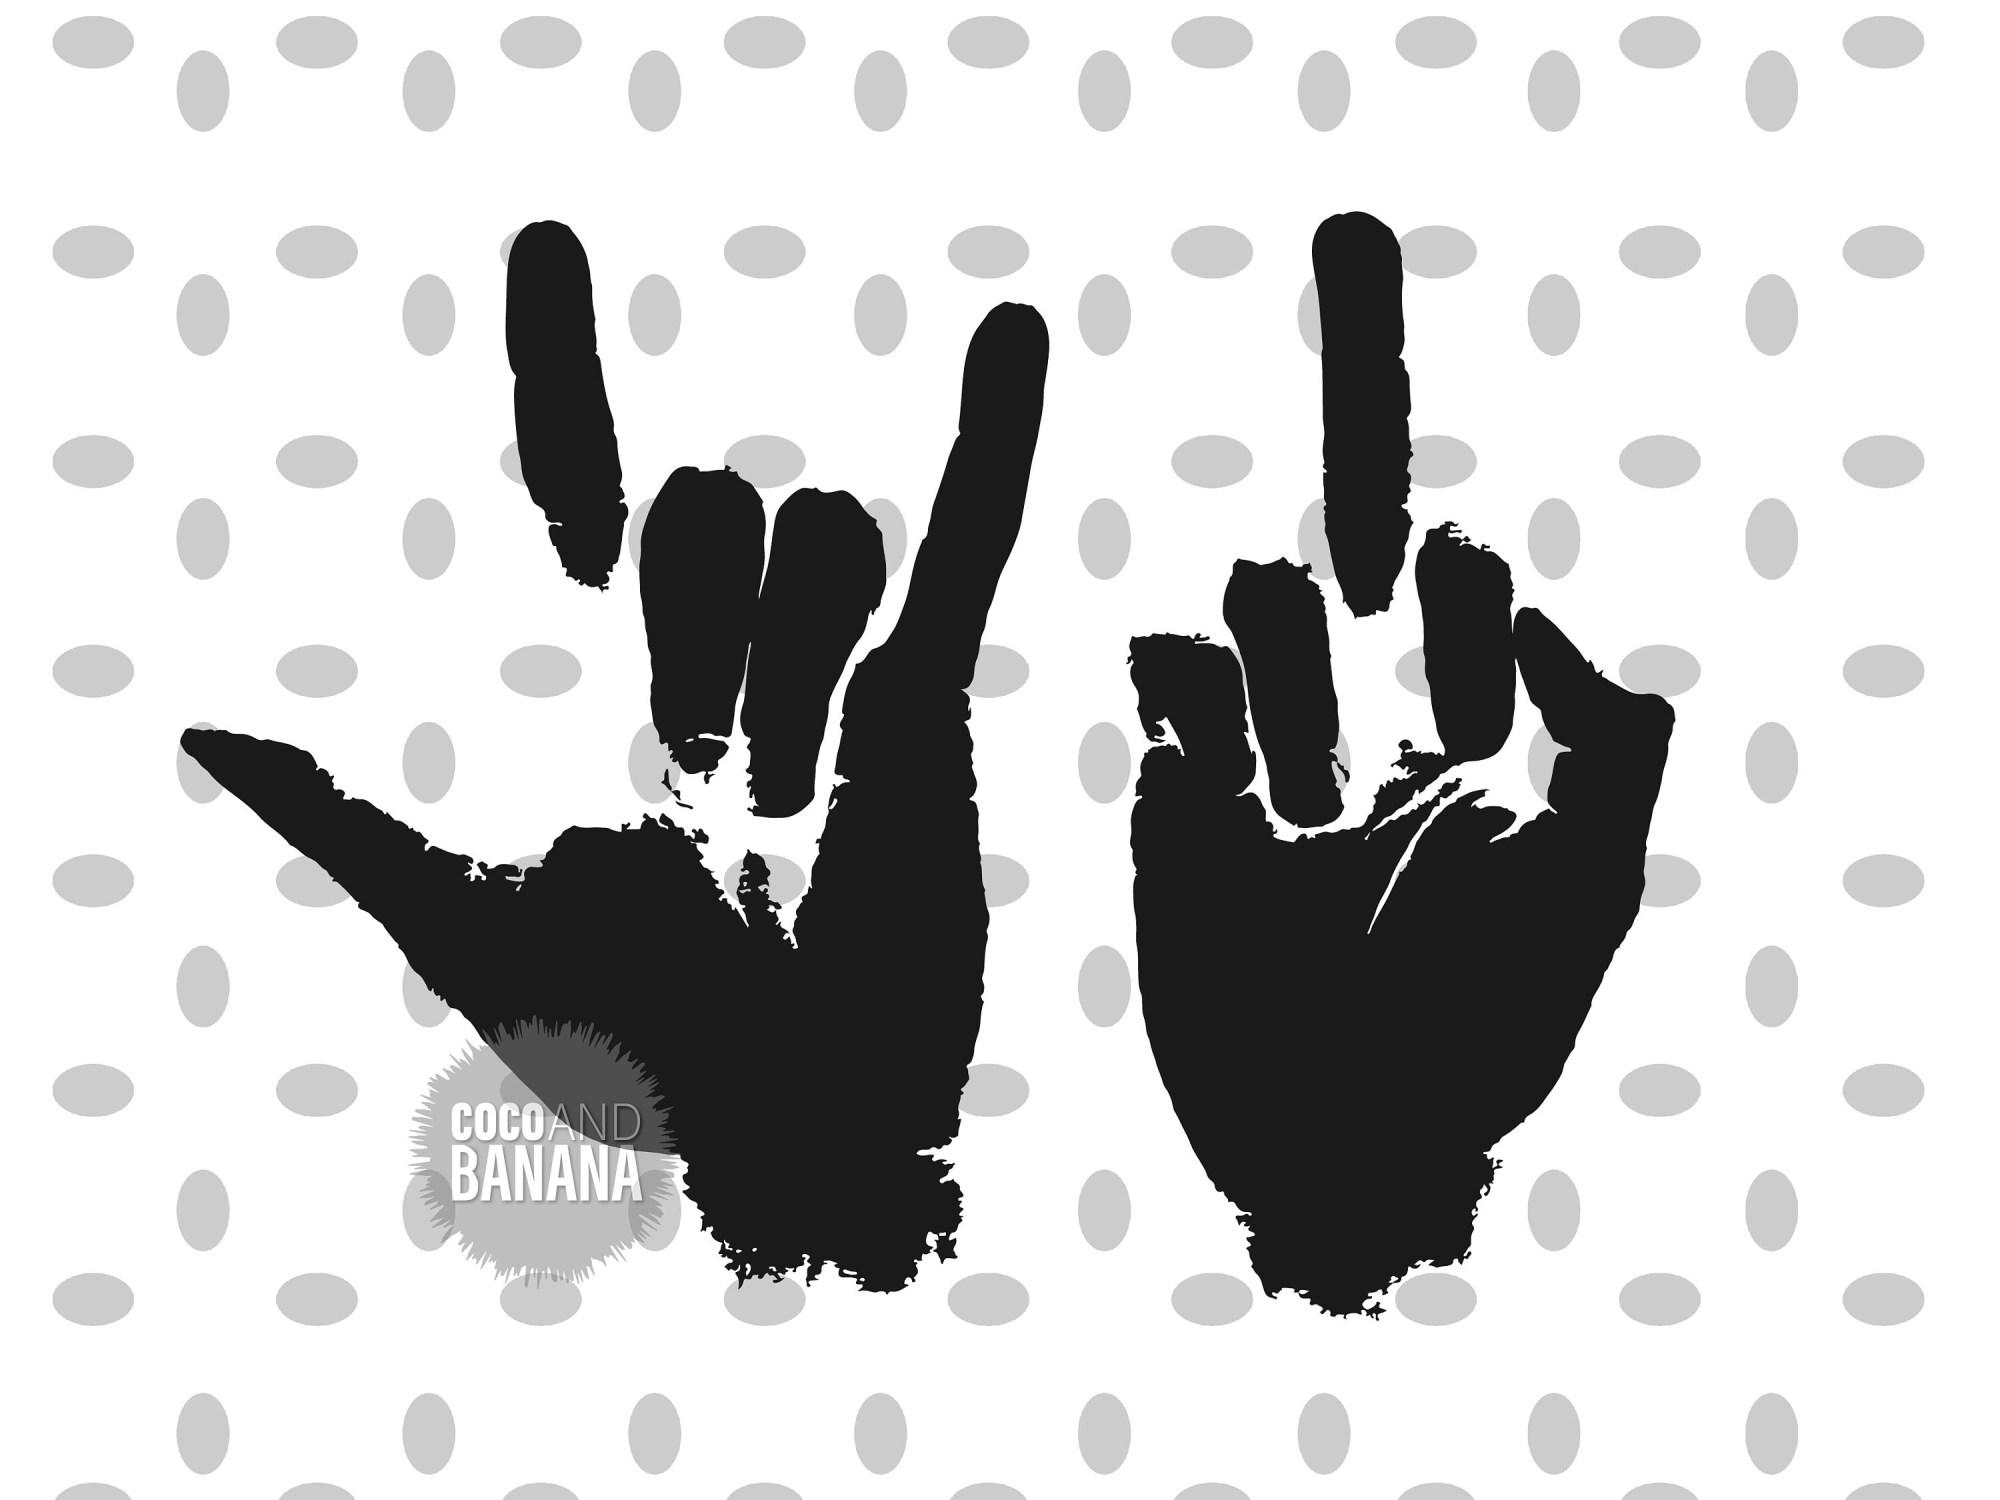 hight resolution of middle finger svg middle finger clipart rock n roll hand svg middle finger silhoutte printable cut files digital file instant download